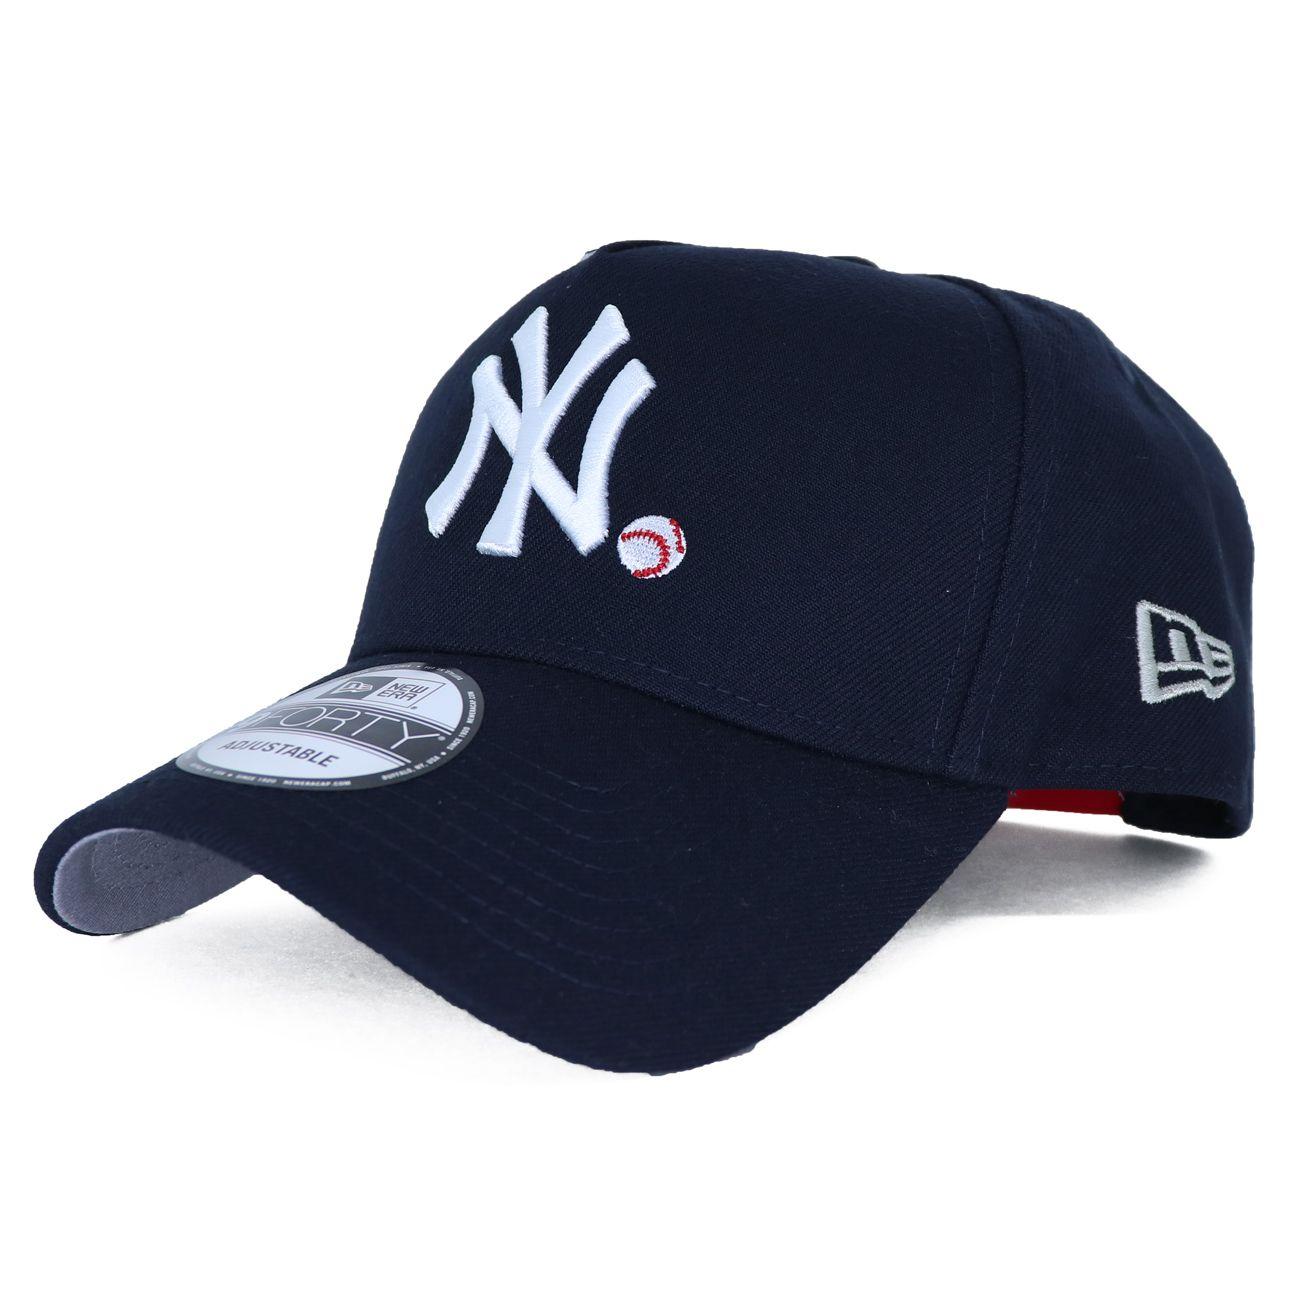 Boné New Era Mlb New York Yankees League 90s